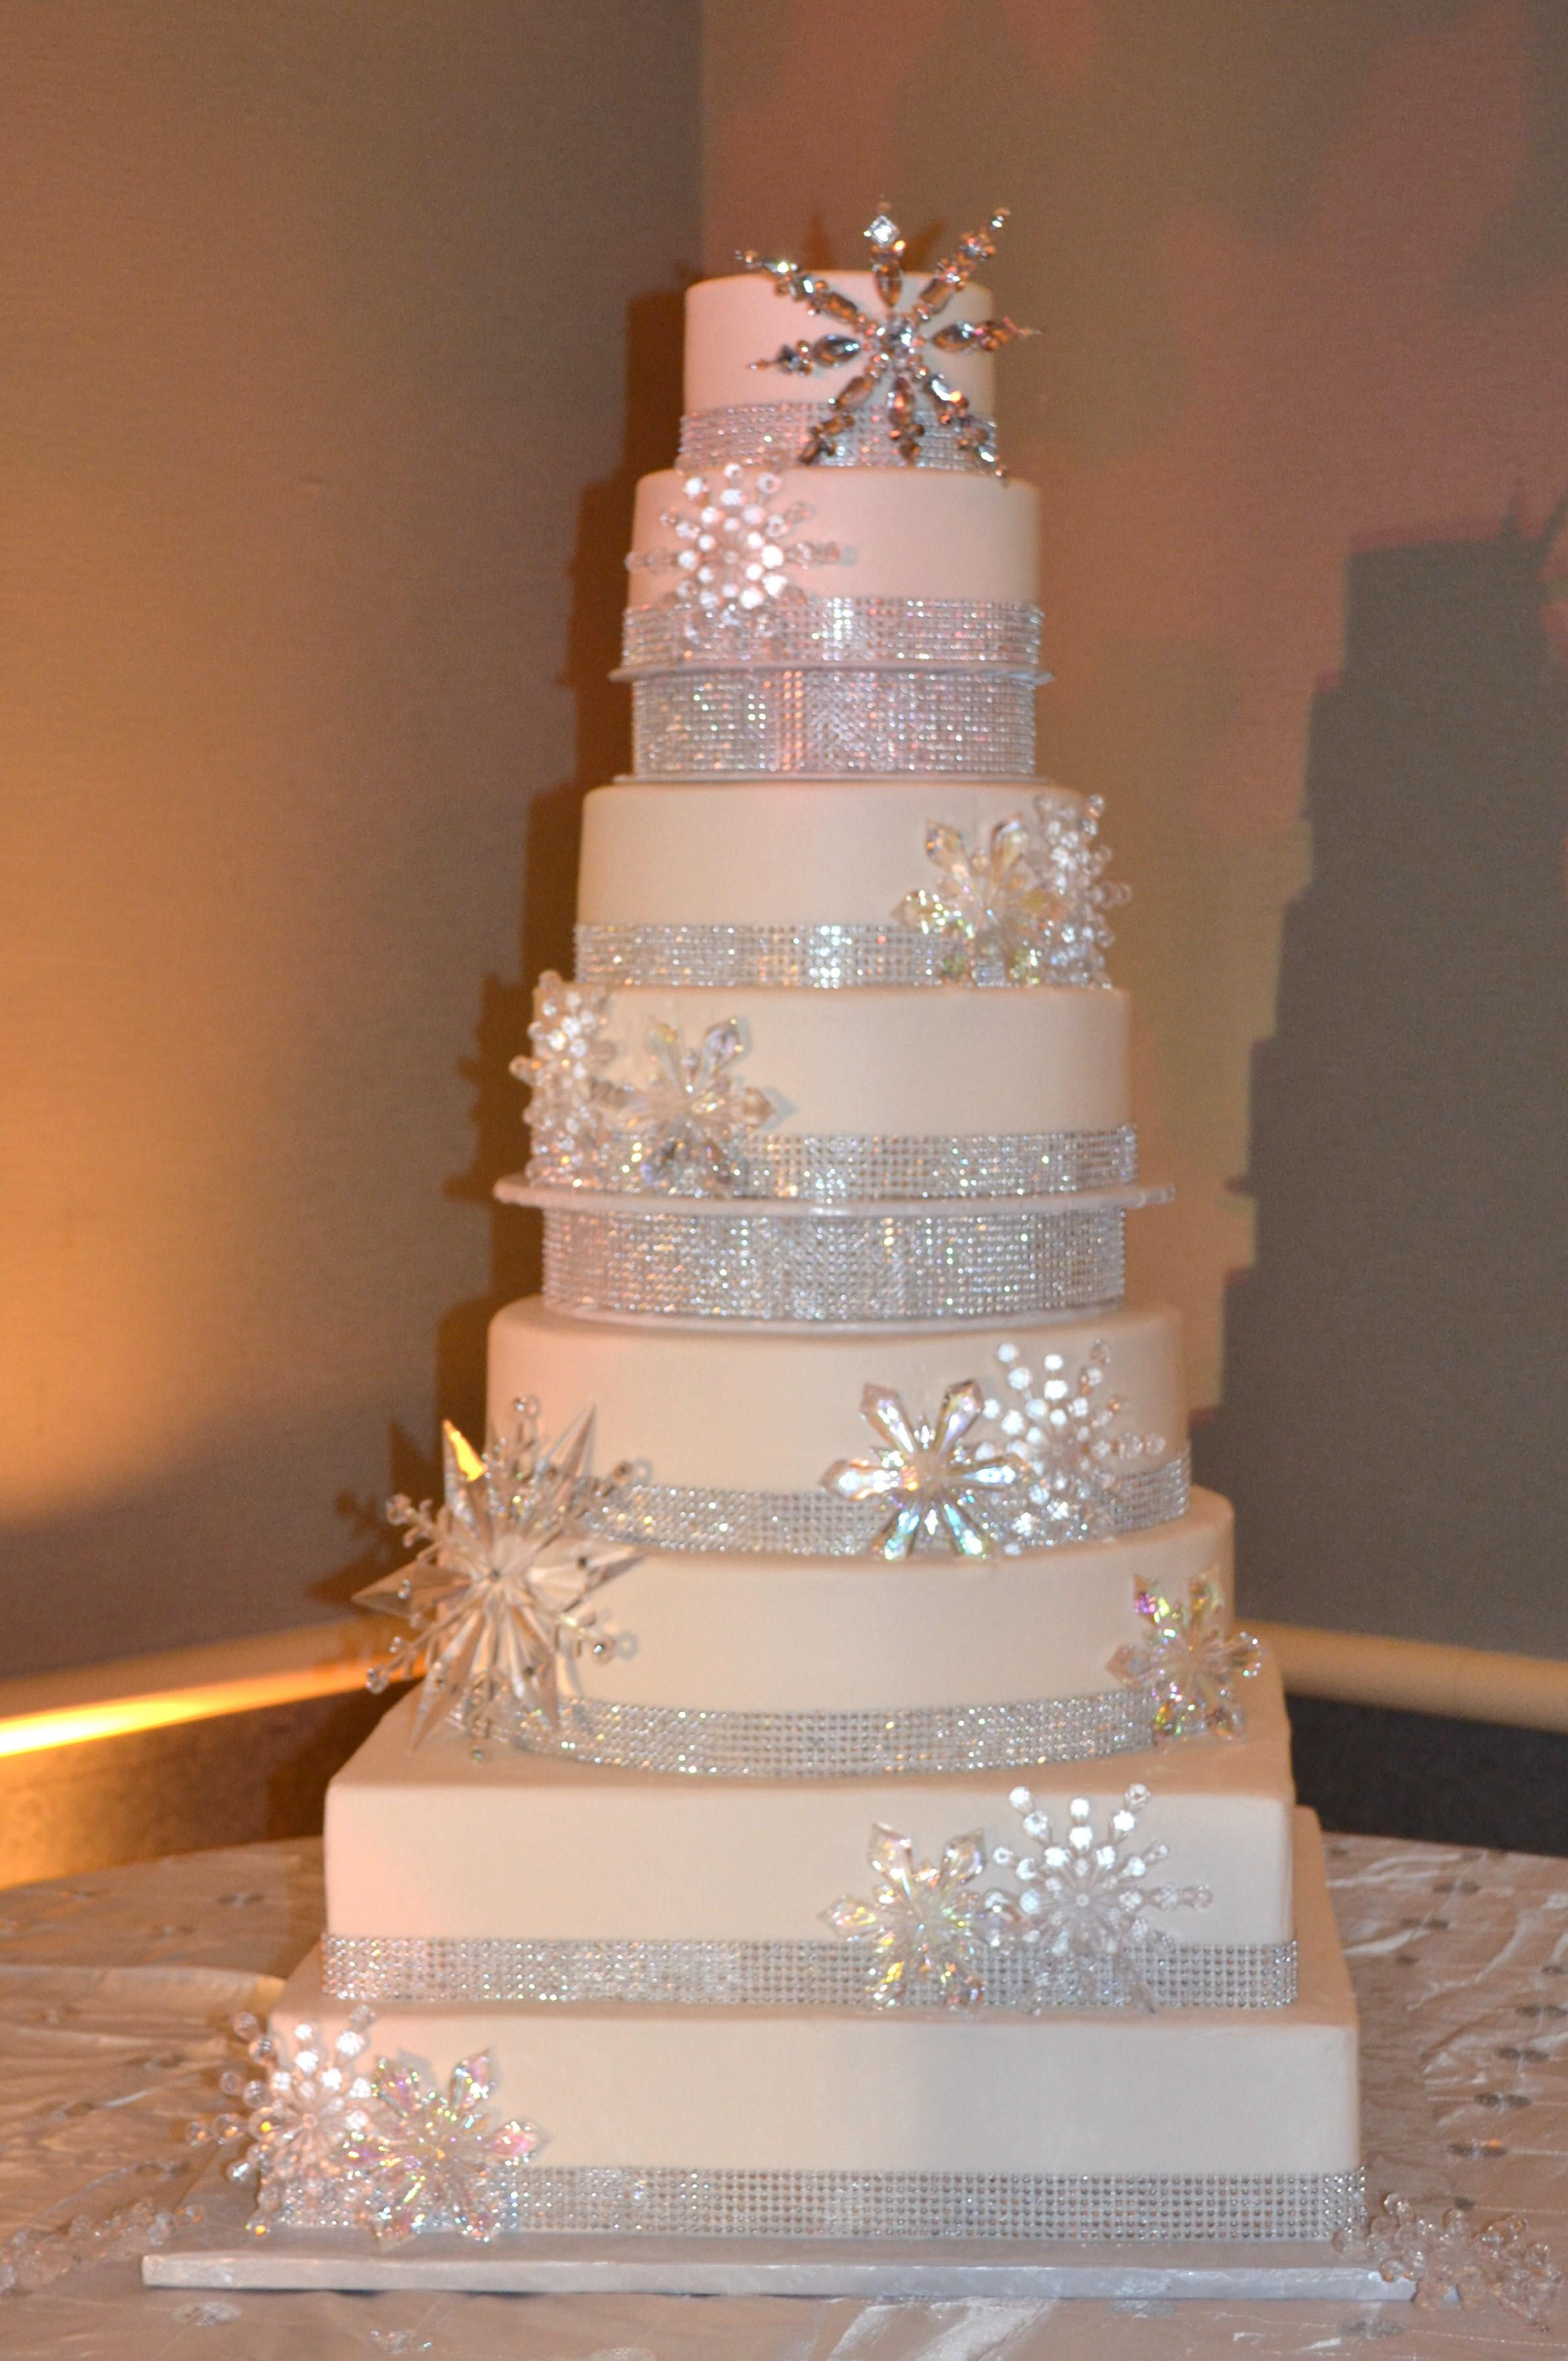 9 Jeweled Snowflake Wedding Cakes Photo - Crystal Snowflake Cake ...